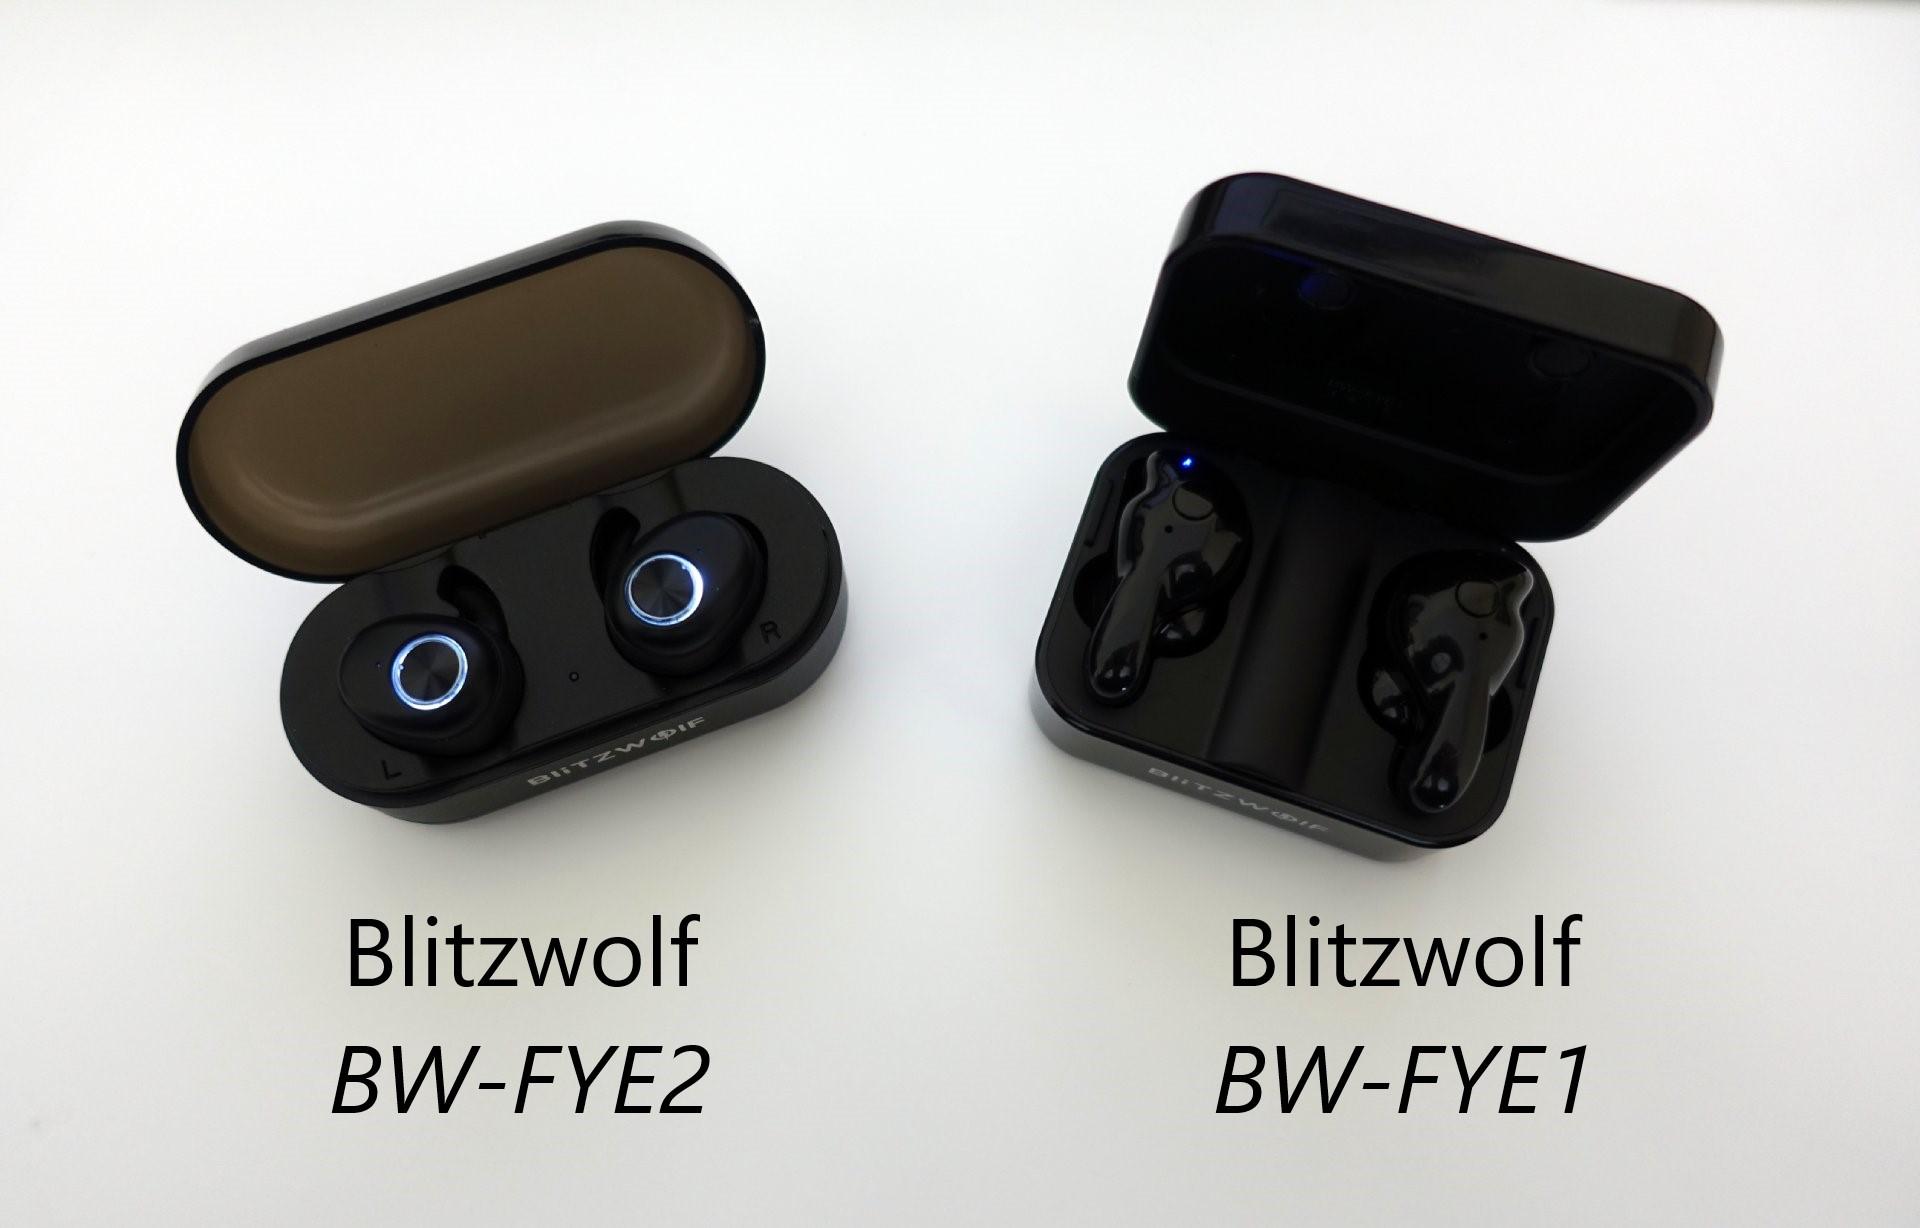 Blitzwolf BW-FYE1 BW-FYE2 hero